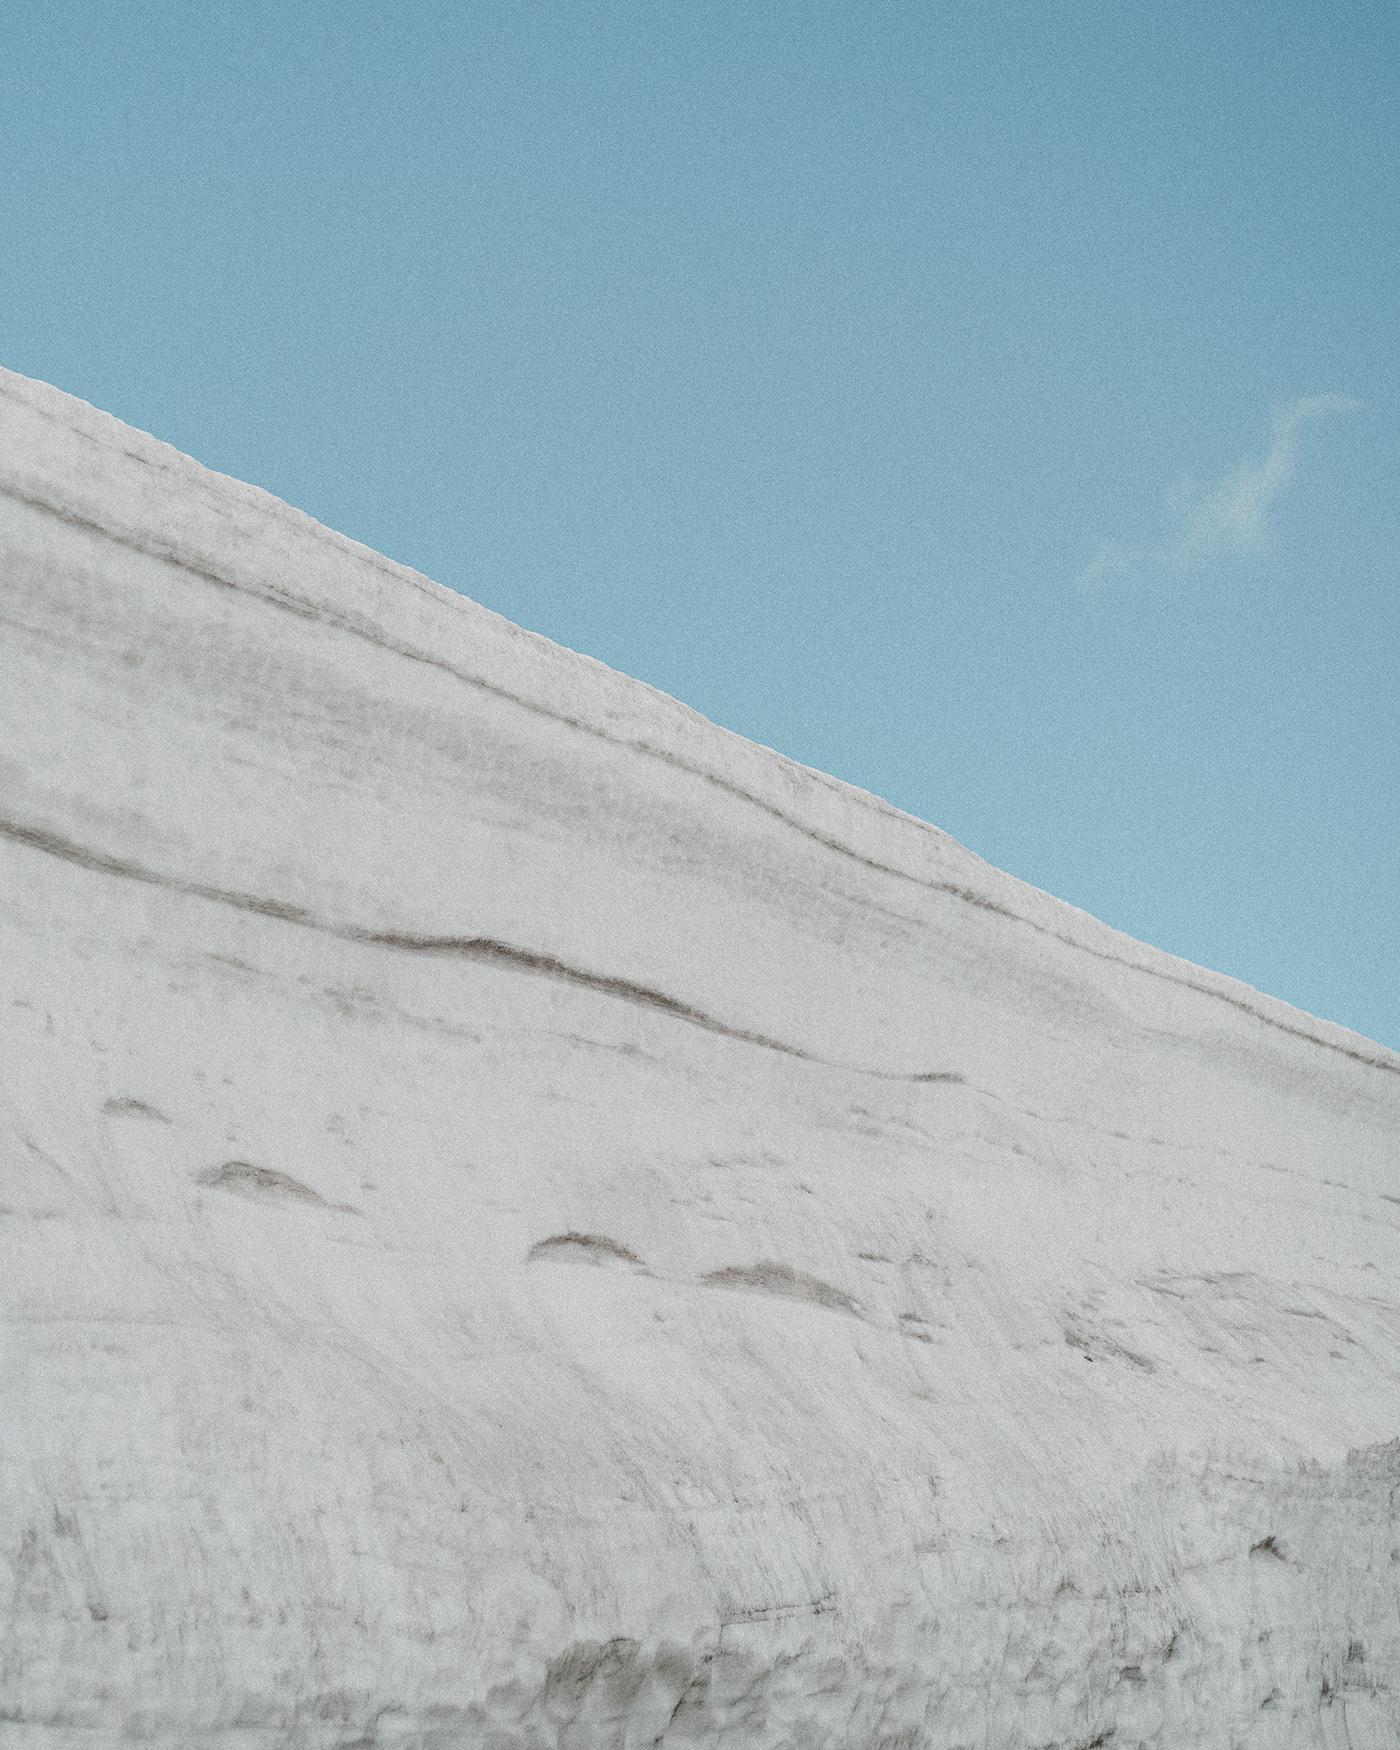 expedition hiking Krkonoše Leica mountain ricoh snapshots Trek